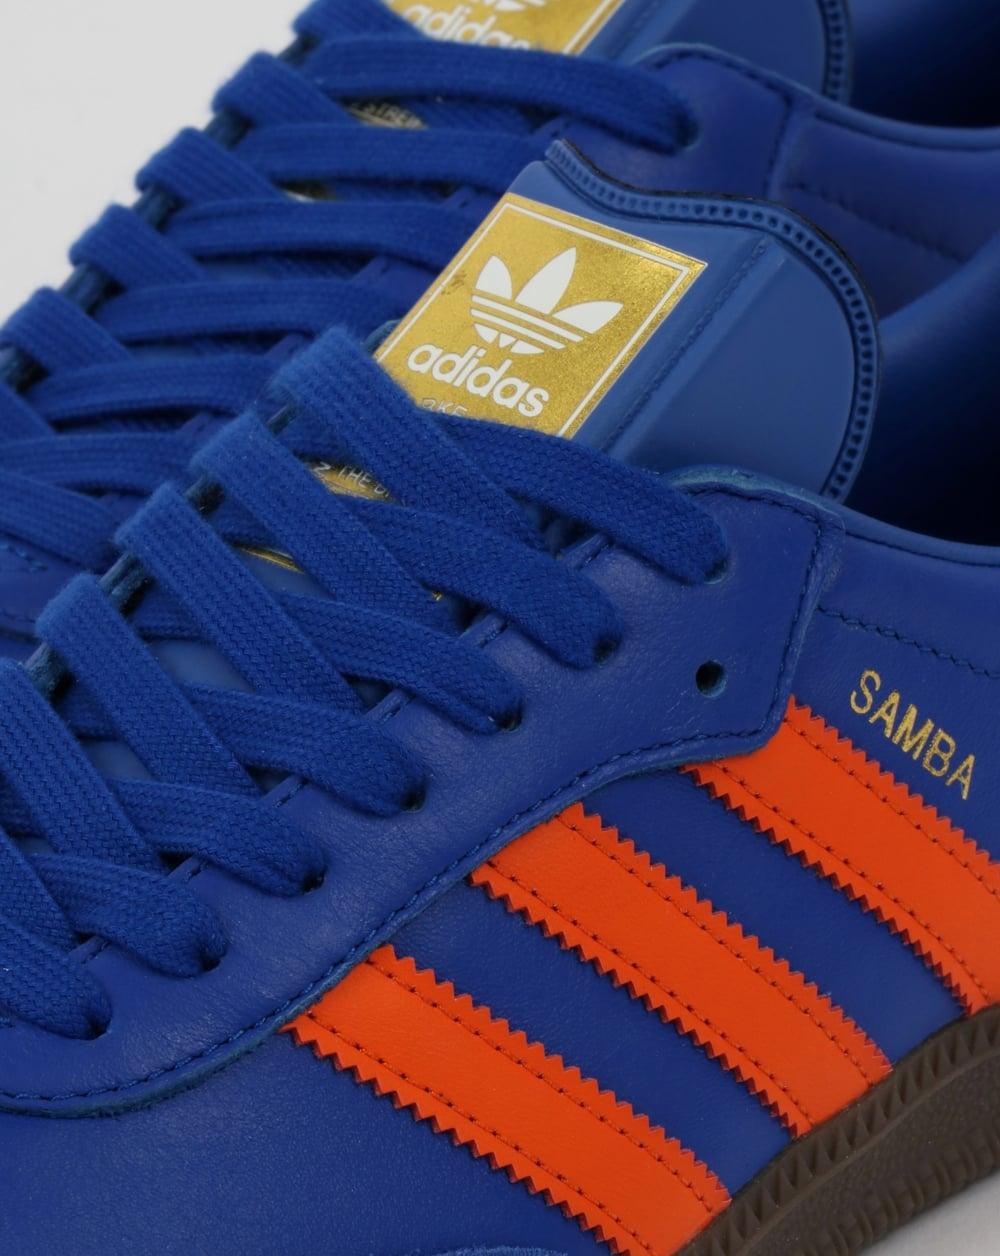 86a1a6de63cf7d ... where to buy adidas samba trainers bold blue orange 8a563 601dc